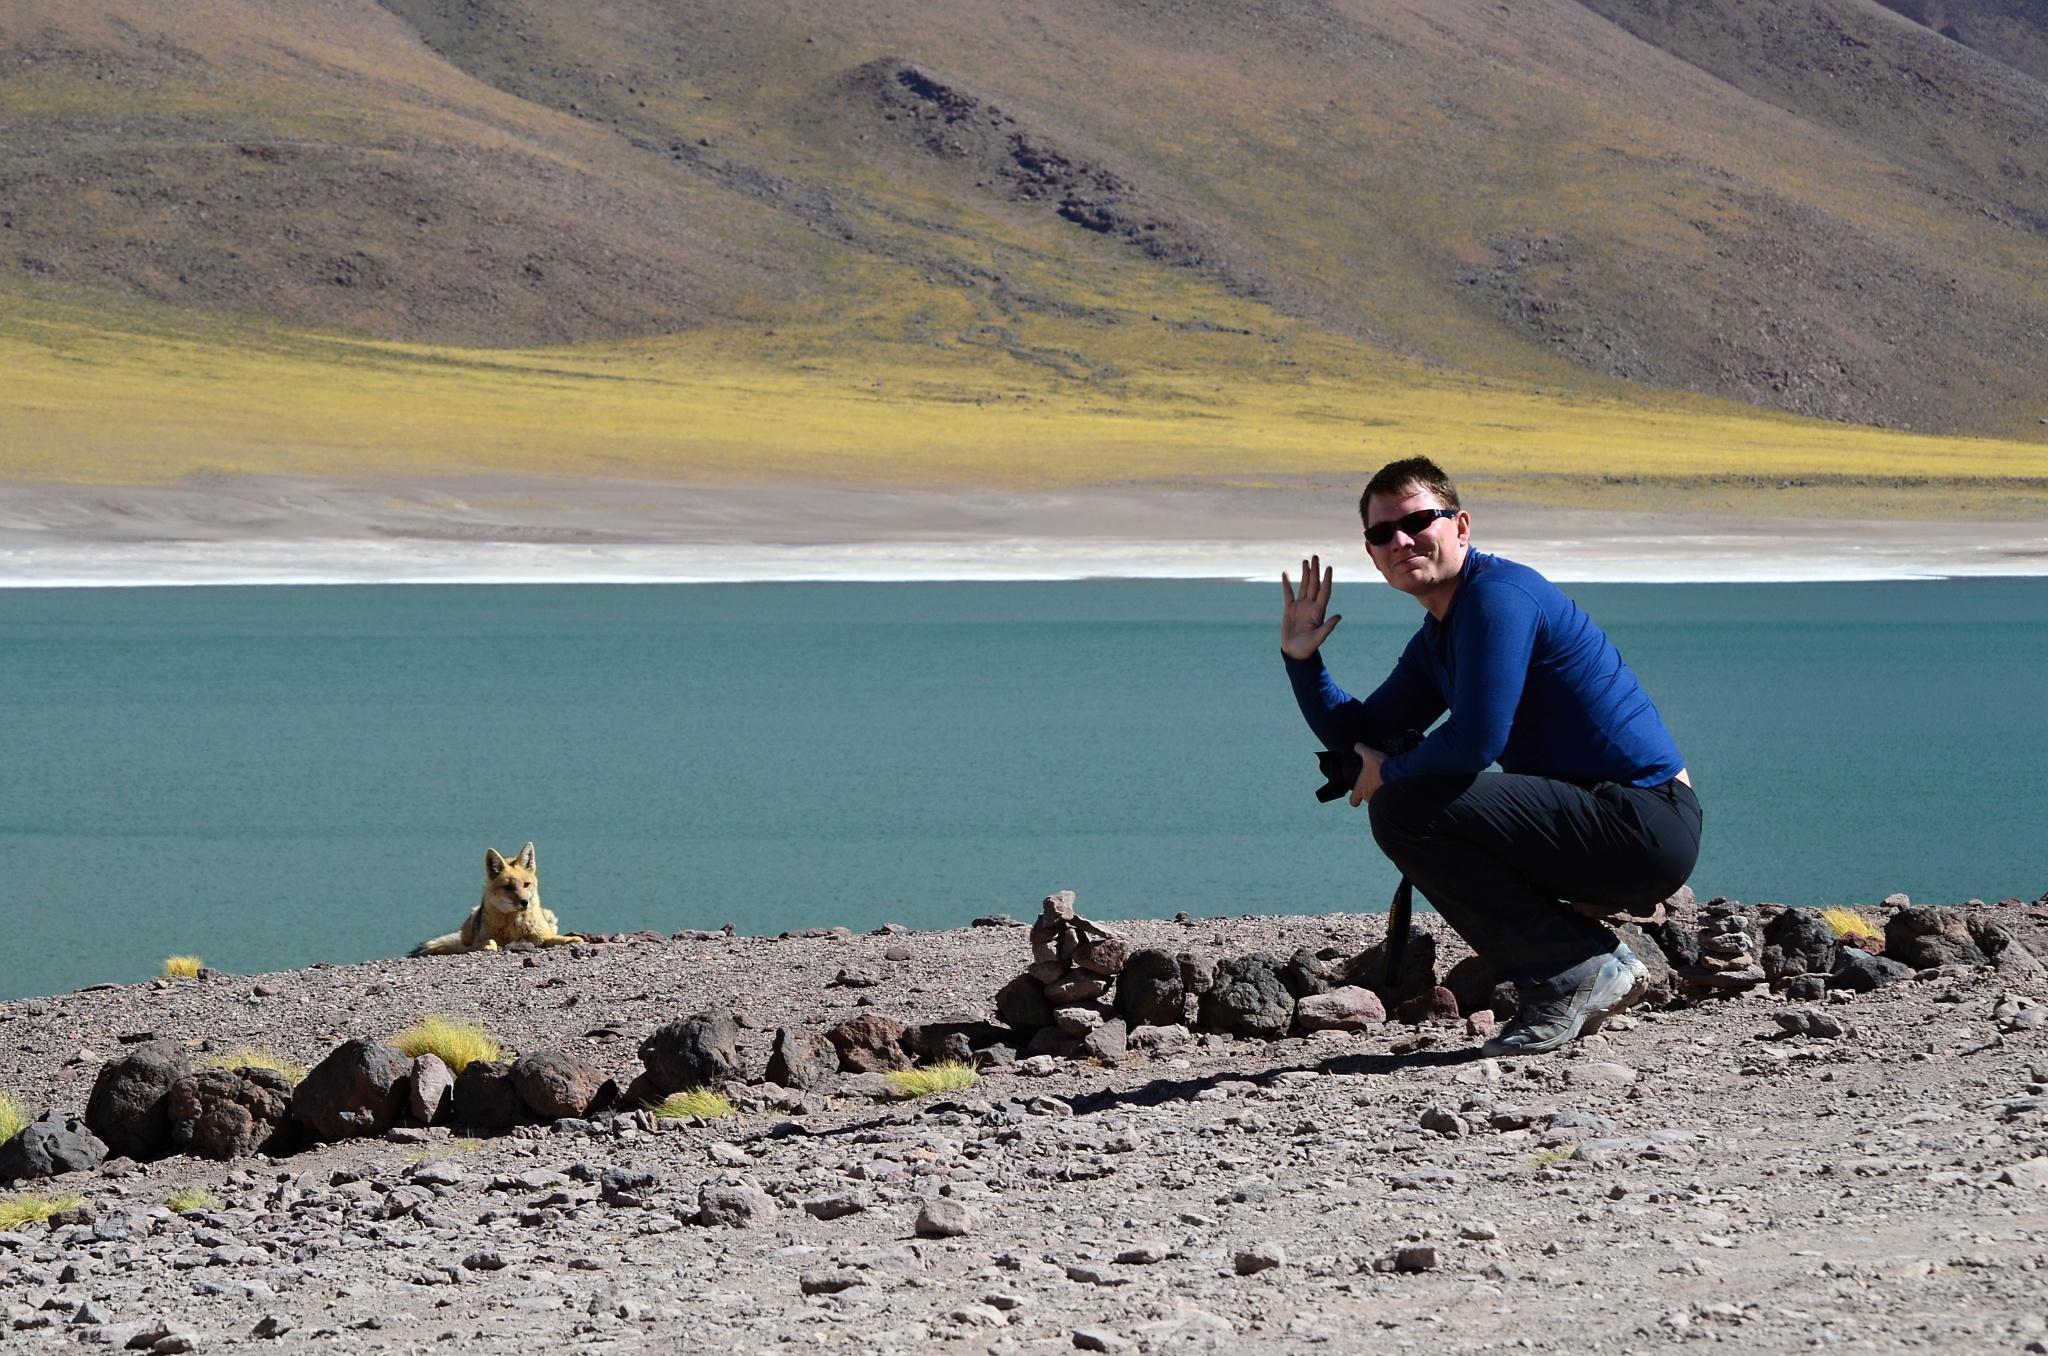 Já a Patagonská liška